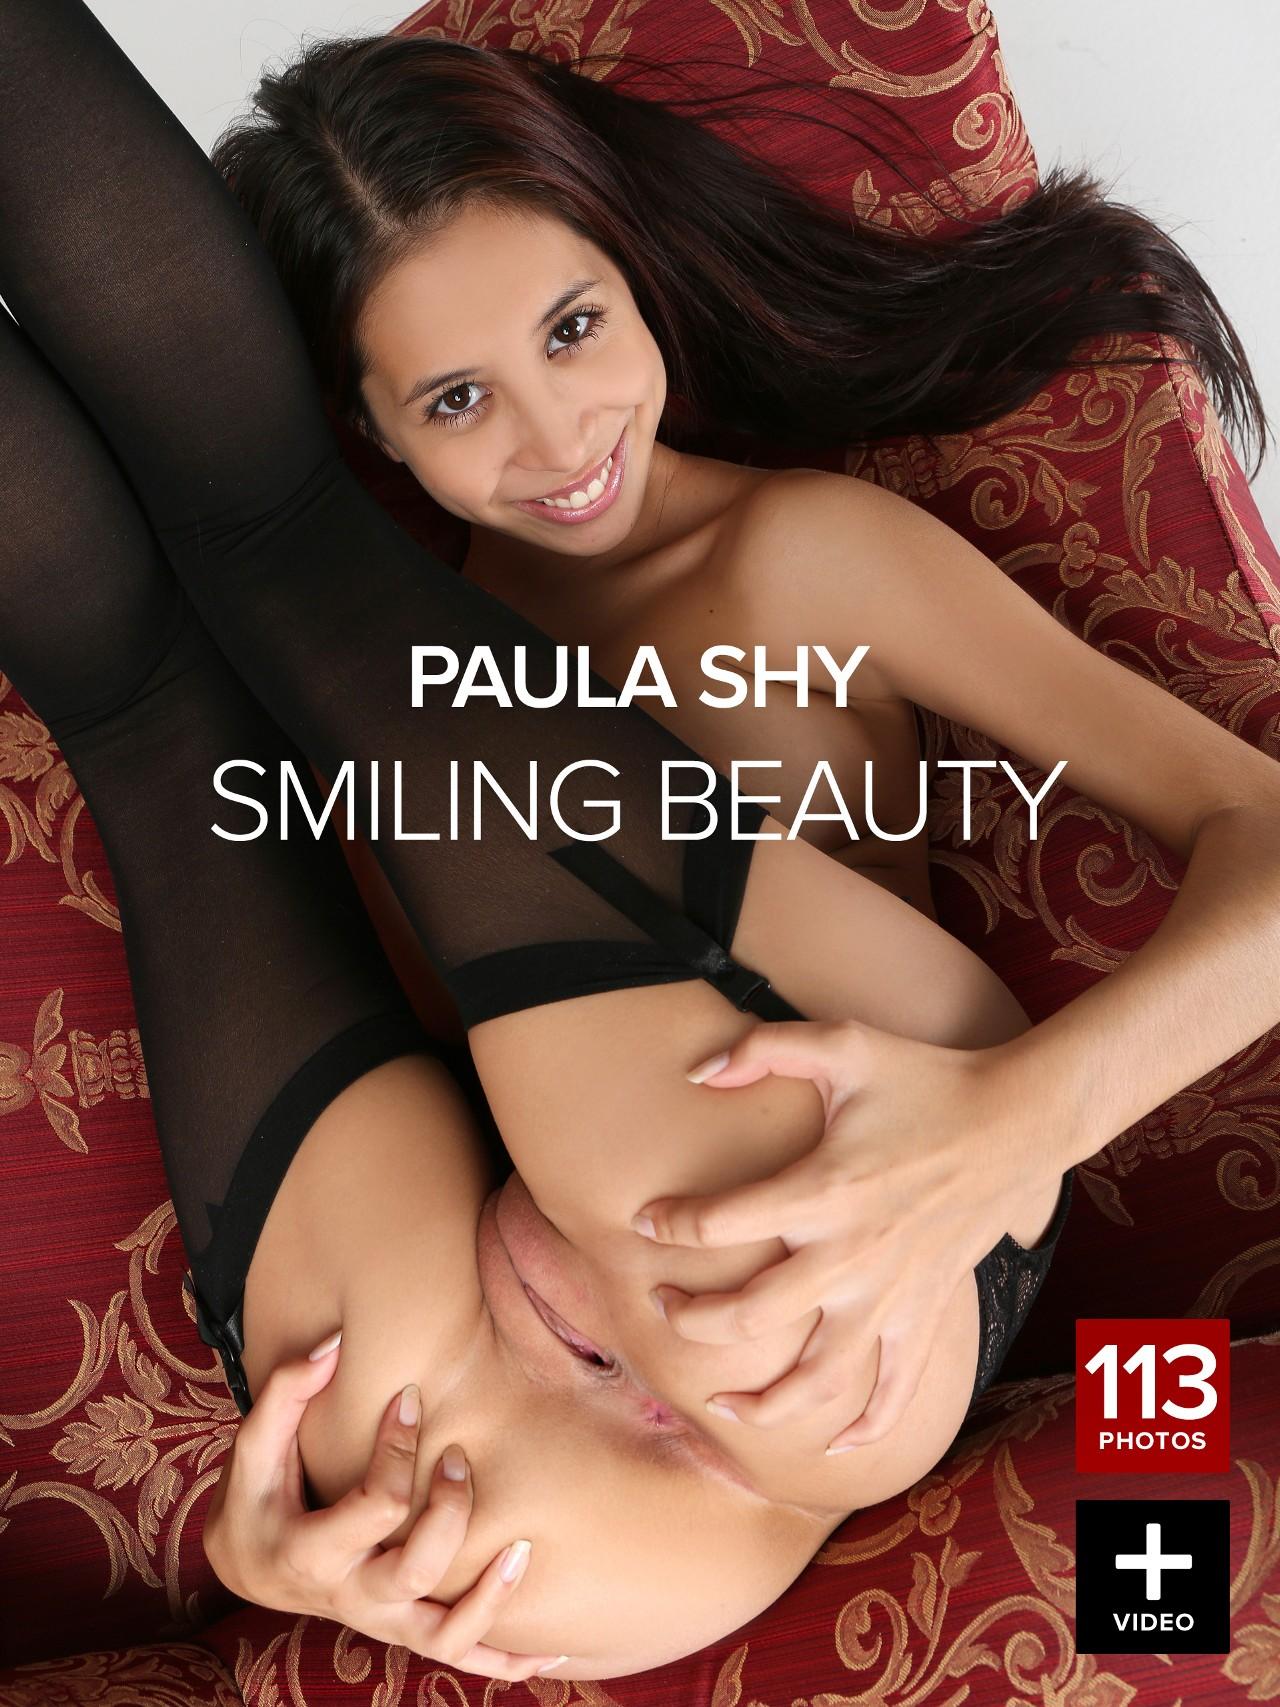 Paula Shy: Smiling beauty